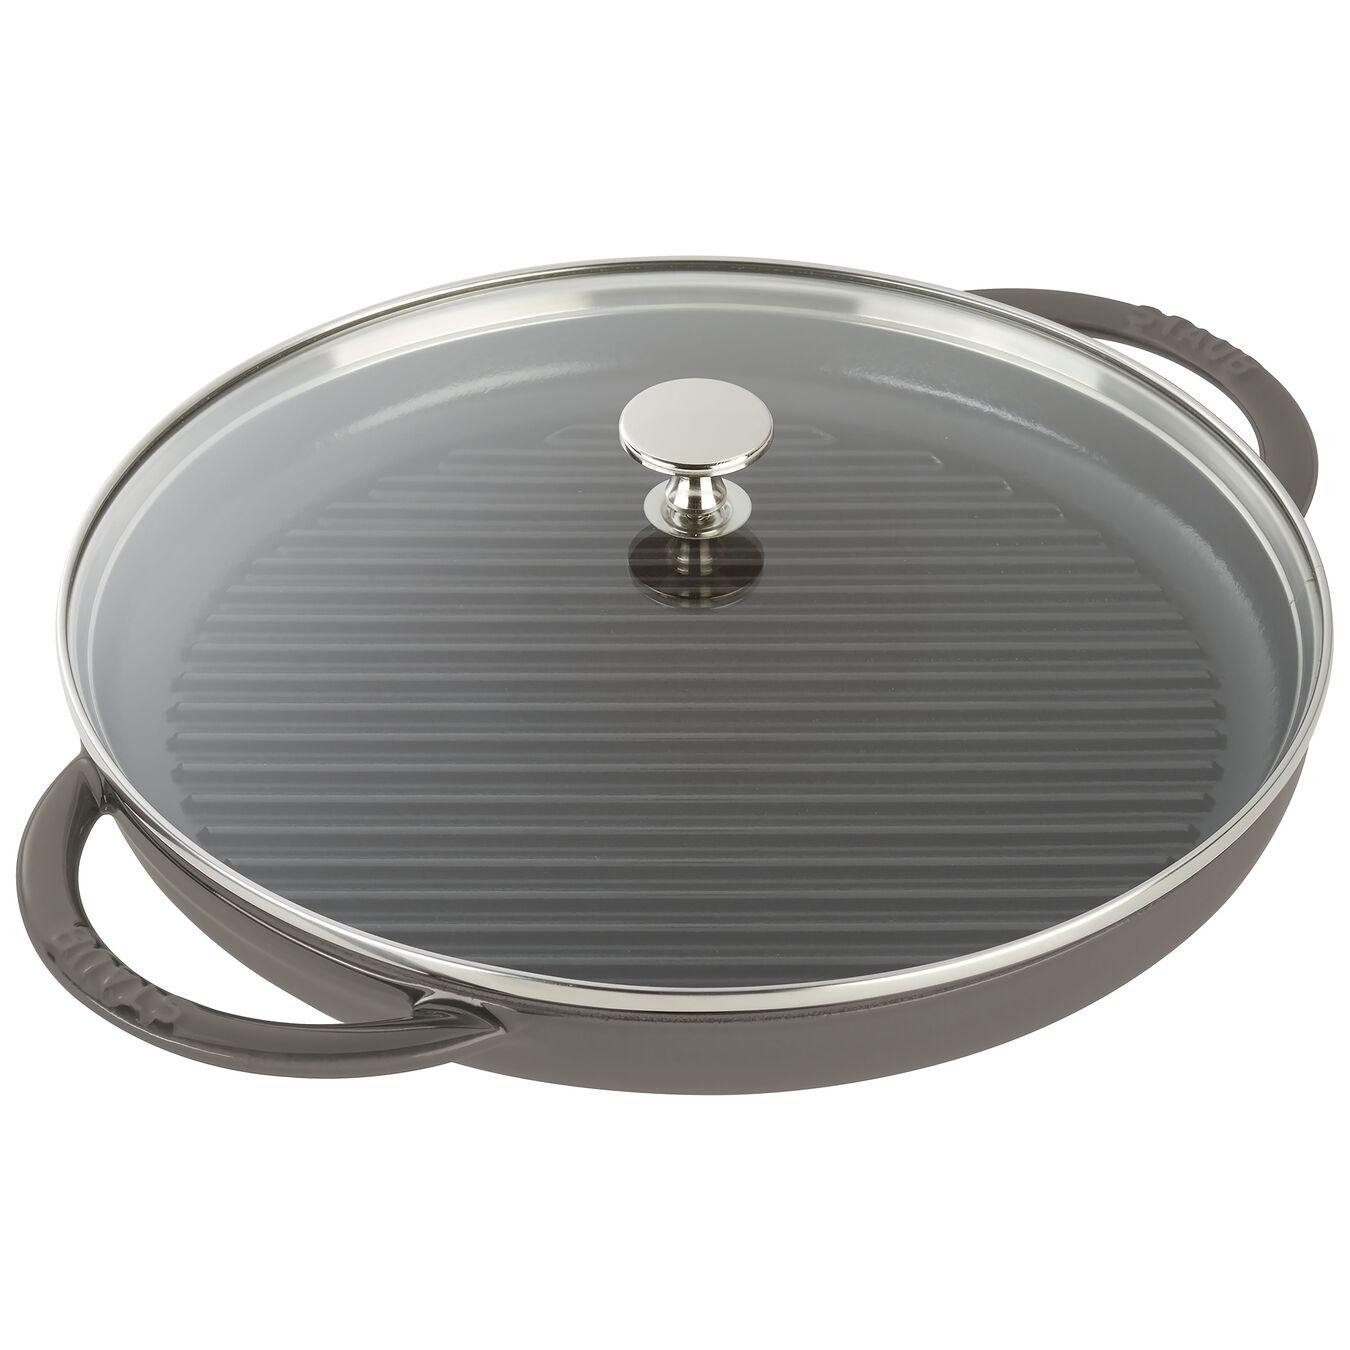 12-inch Round Steam Grill - Graphite Grey,,large 1